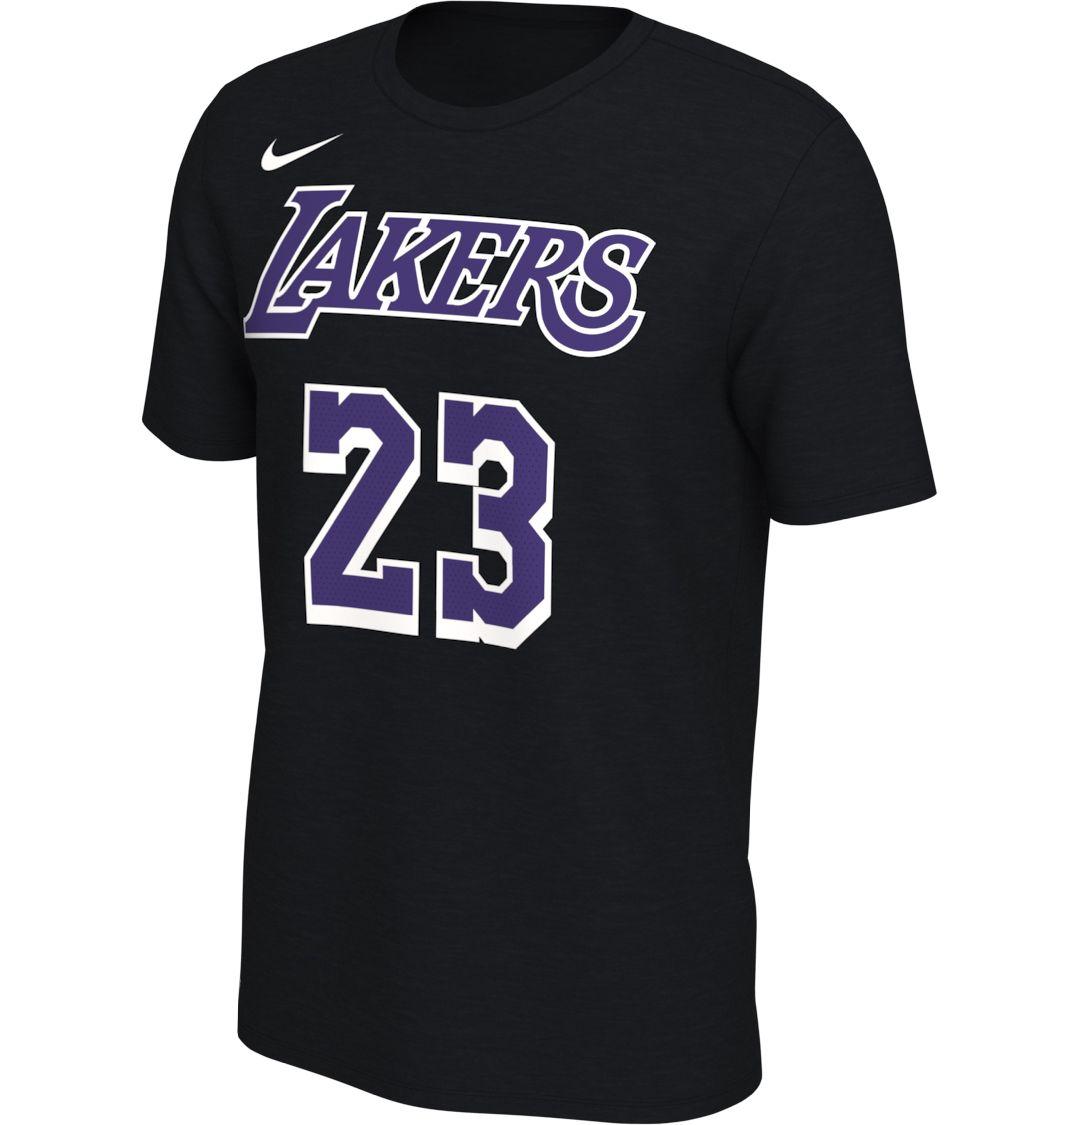 promo code 51d1a 028c7 Nike Men's Los Angeles Lakers LeBron James #23 Dri-FIT Black T-Shirt